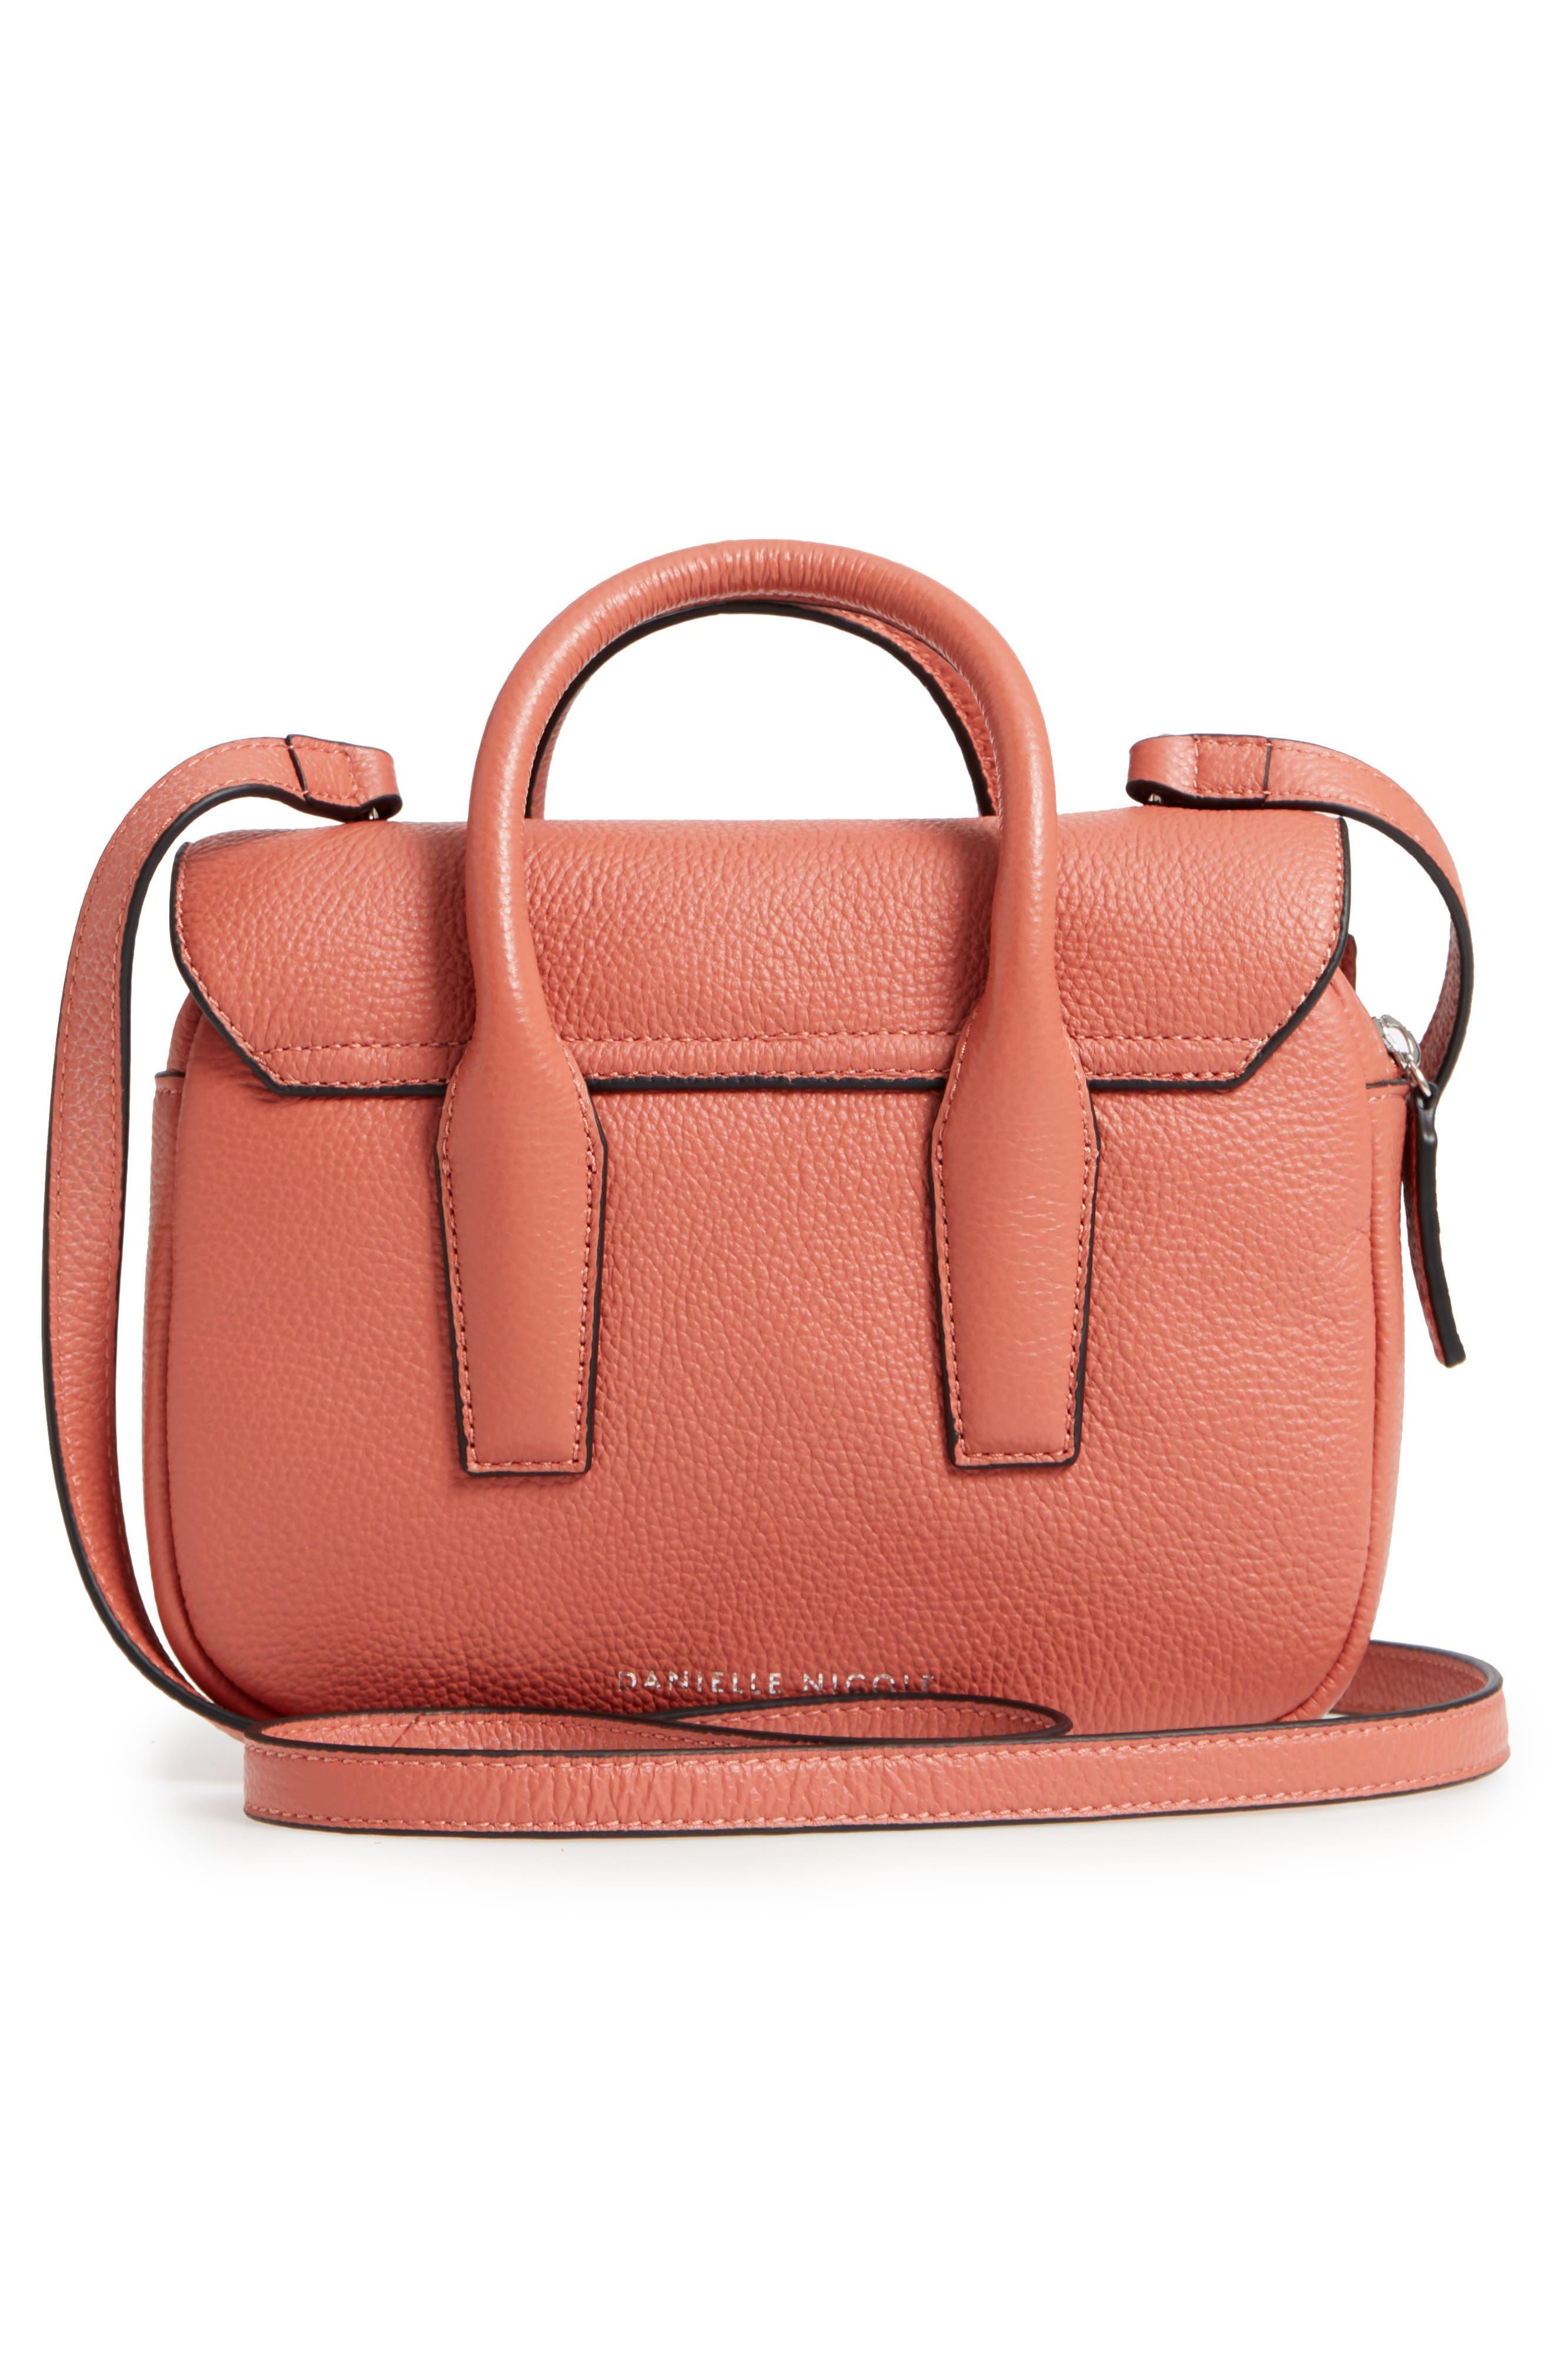 DANIELLE NICOLE,                             Kinsley Leather Crossbody Bag,                             Alternate thumbnail 3, color,                             600